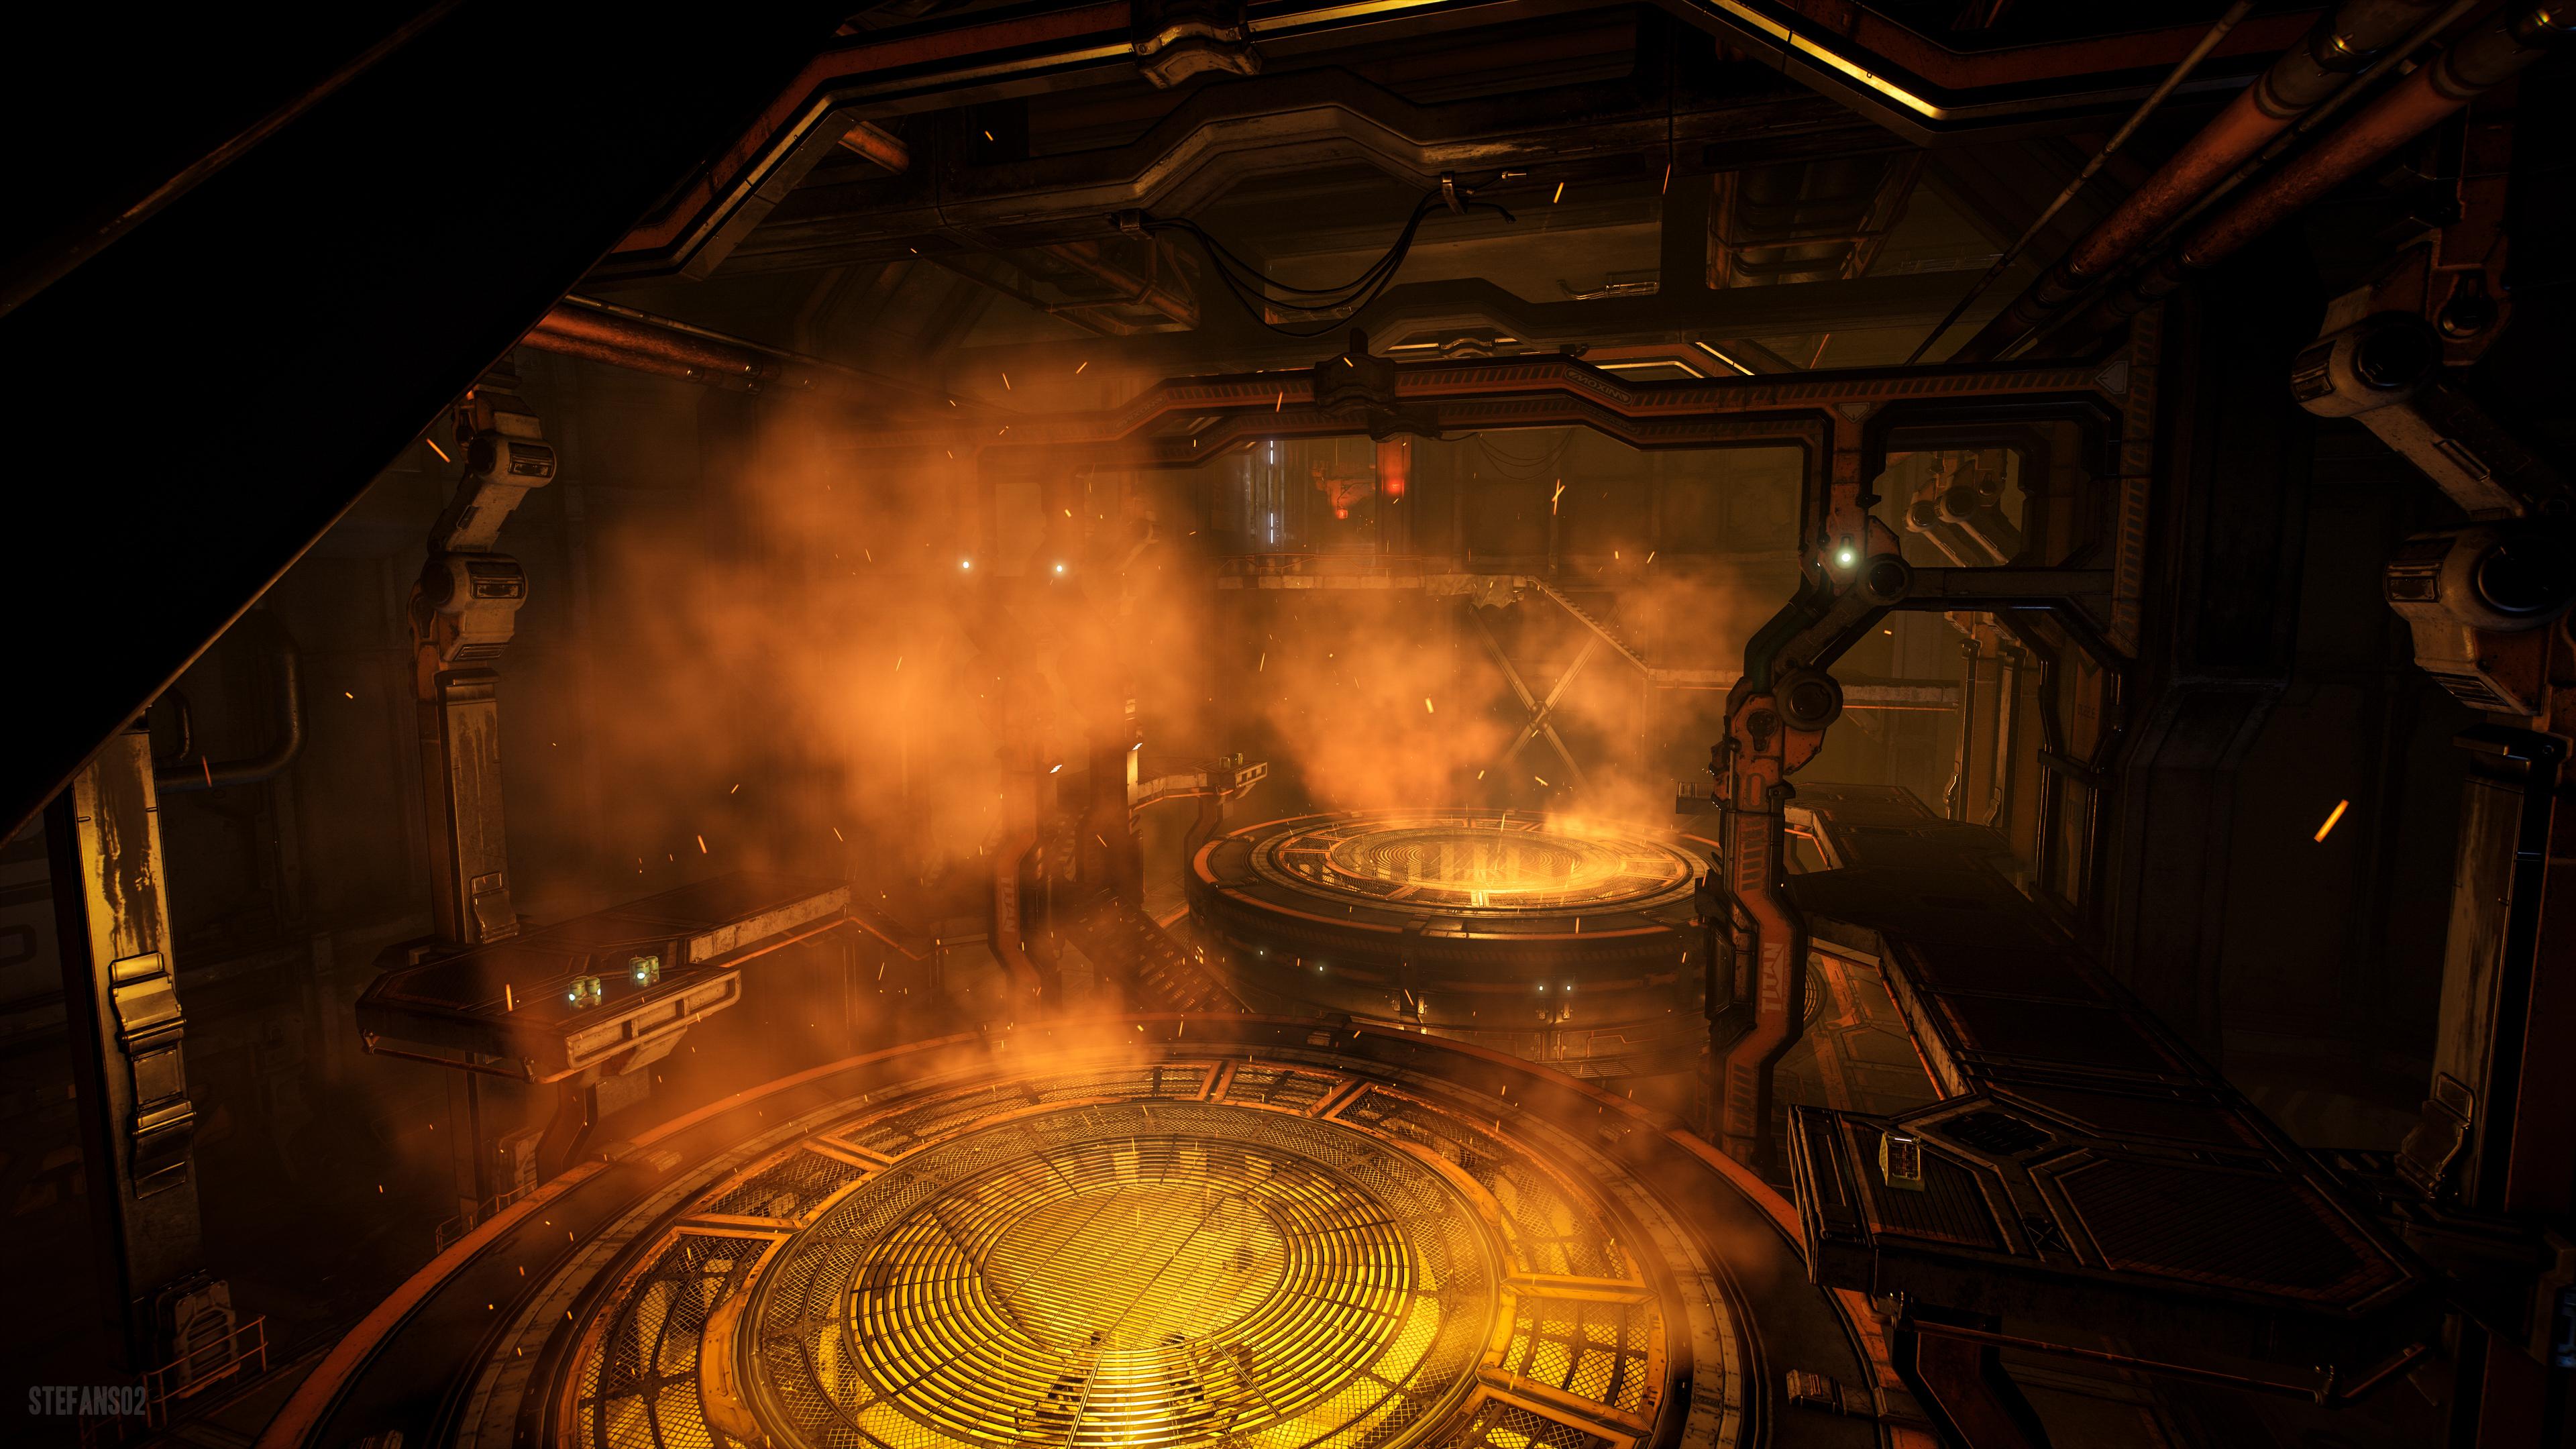 Doom Forge Vents 4k Ultra Hd Wallpaper Background